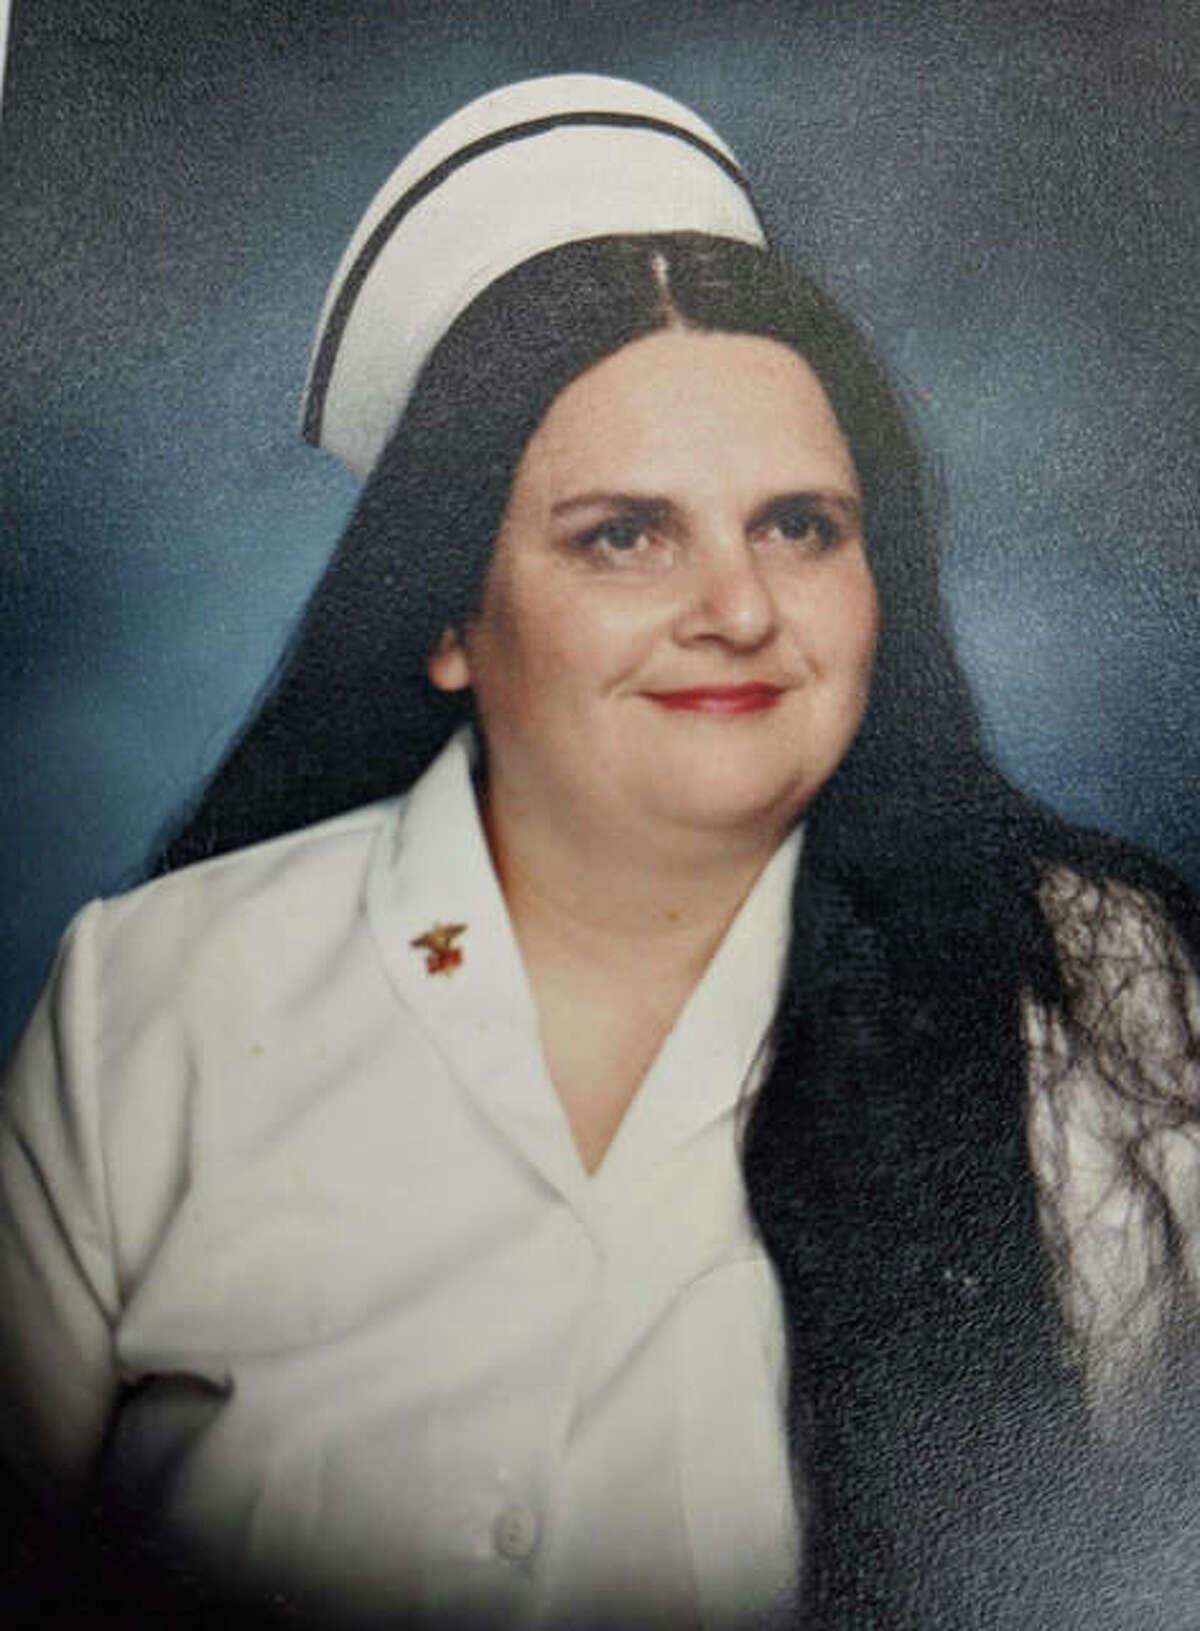 A photo of Carolyn McBride from her nursing school graduation in 1995.